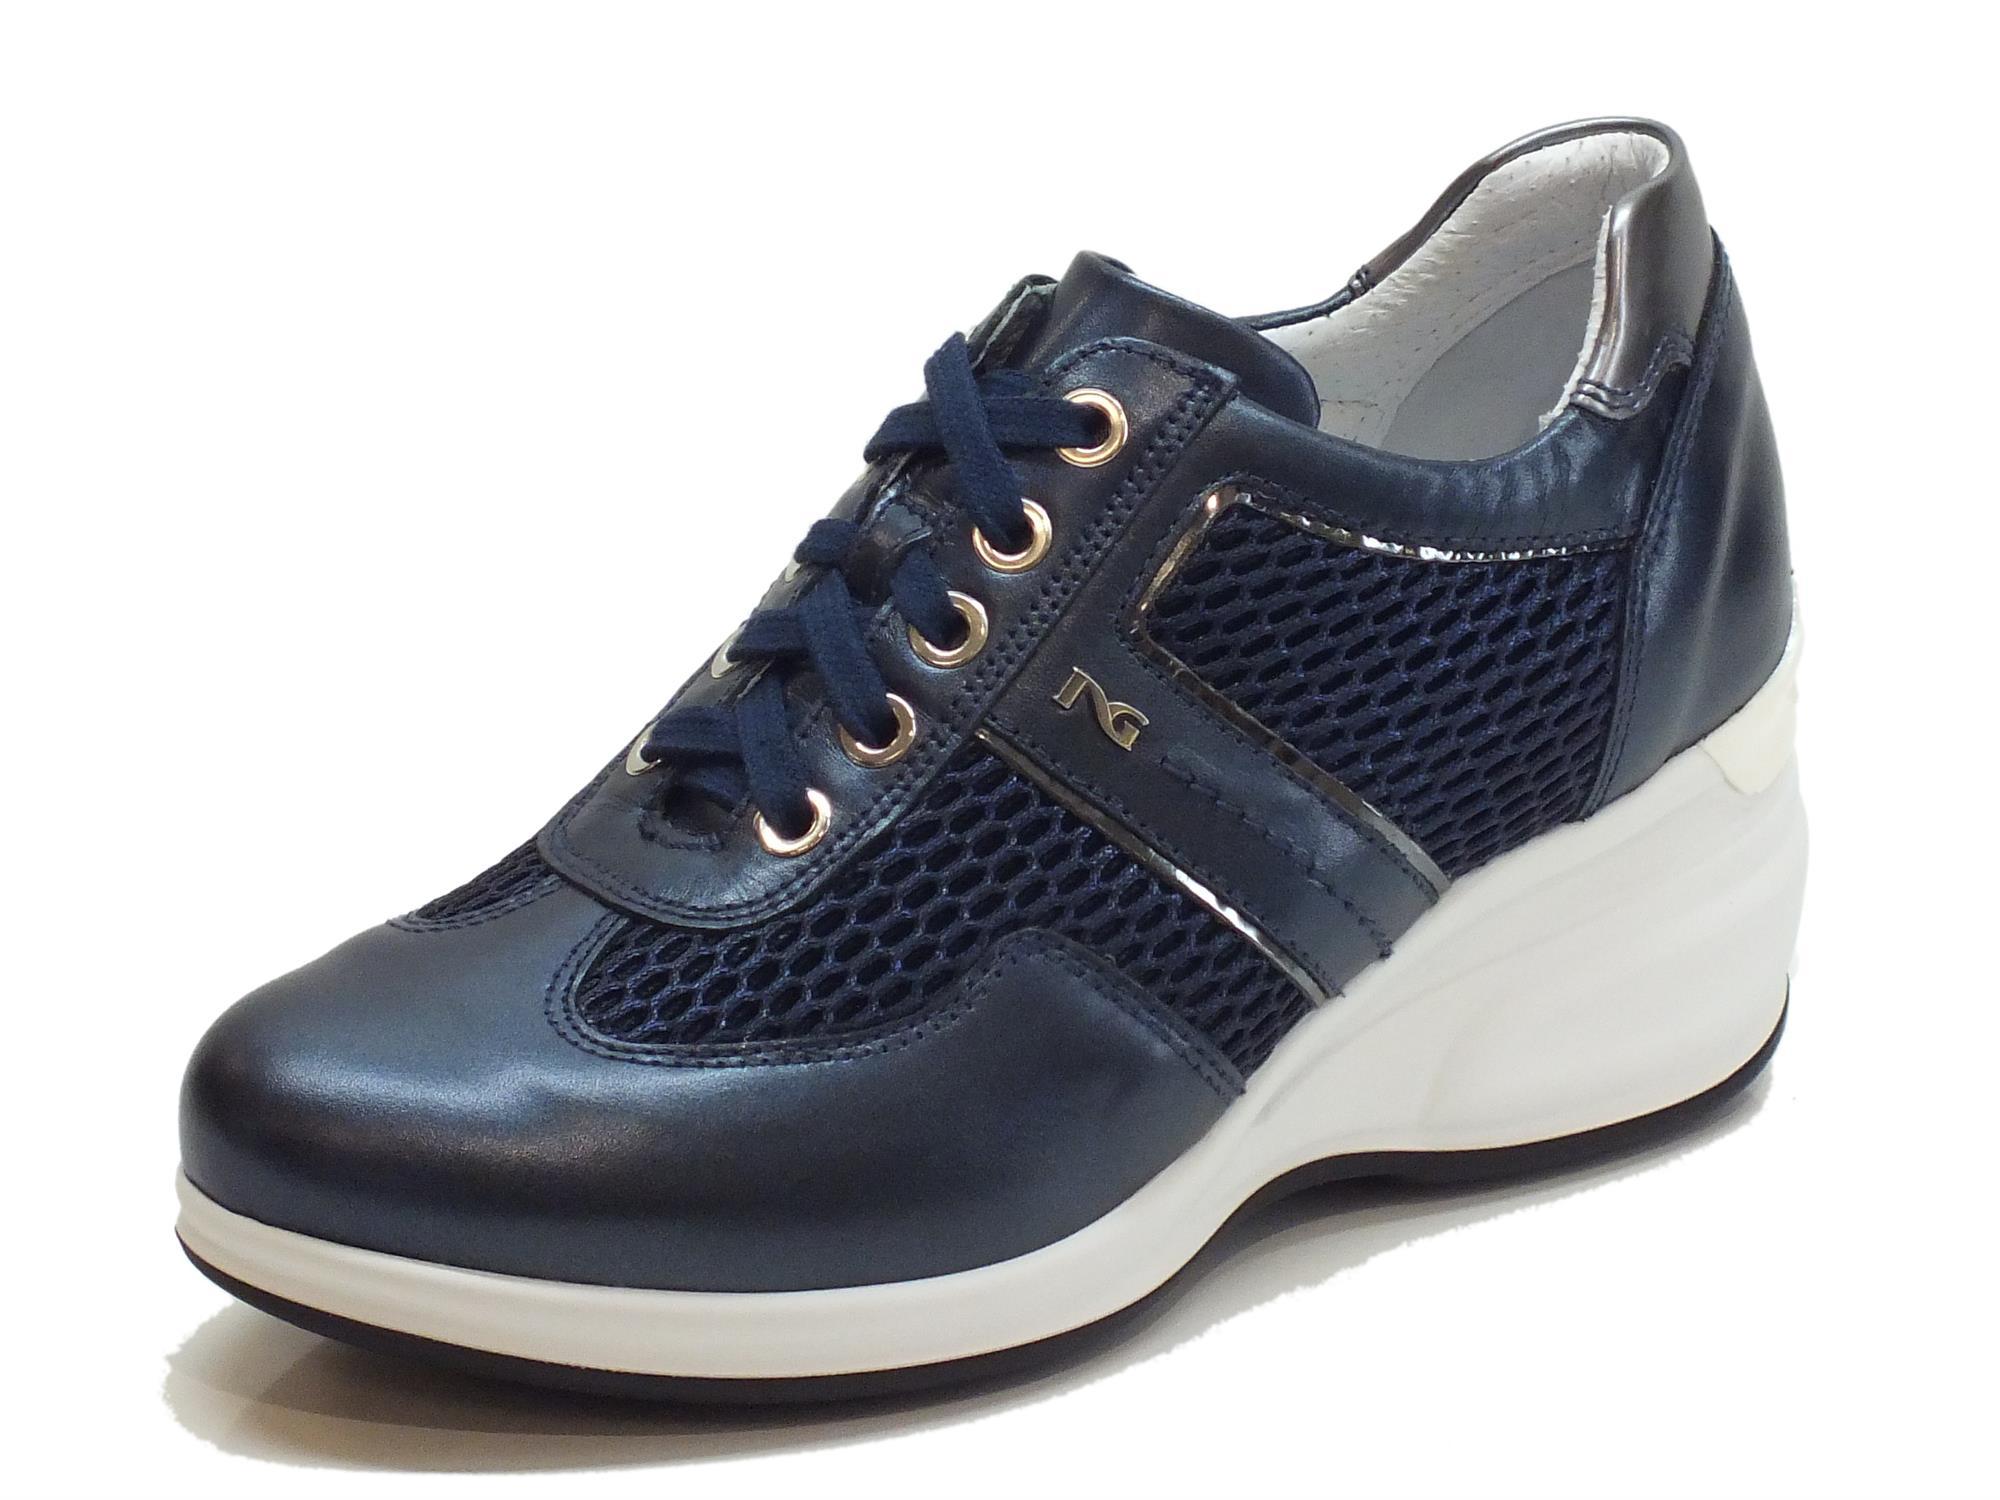 ad660885a95986 Sneakers NeroGiardini per donna in pelle e tessuto blu oceano zeppa alta -  mainstreetblytheville.org